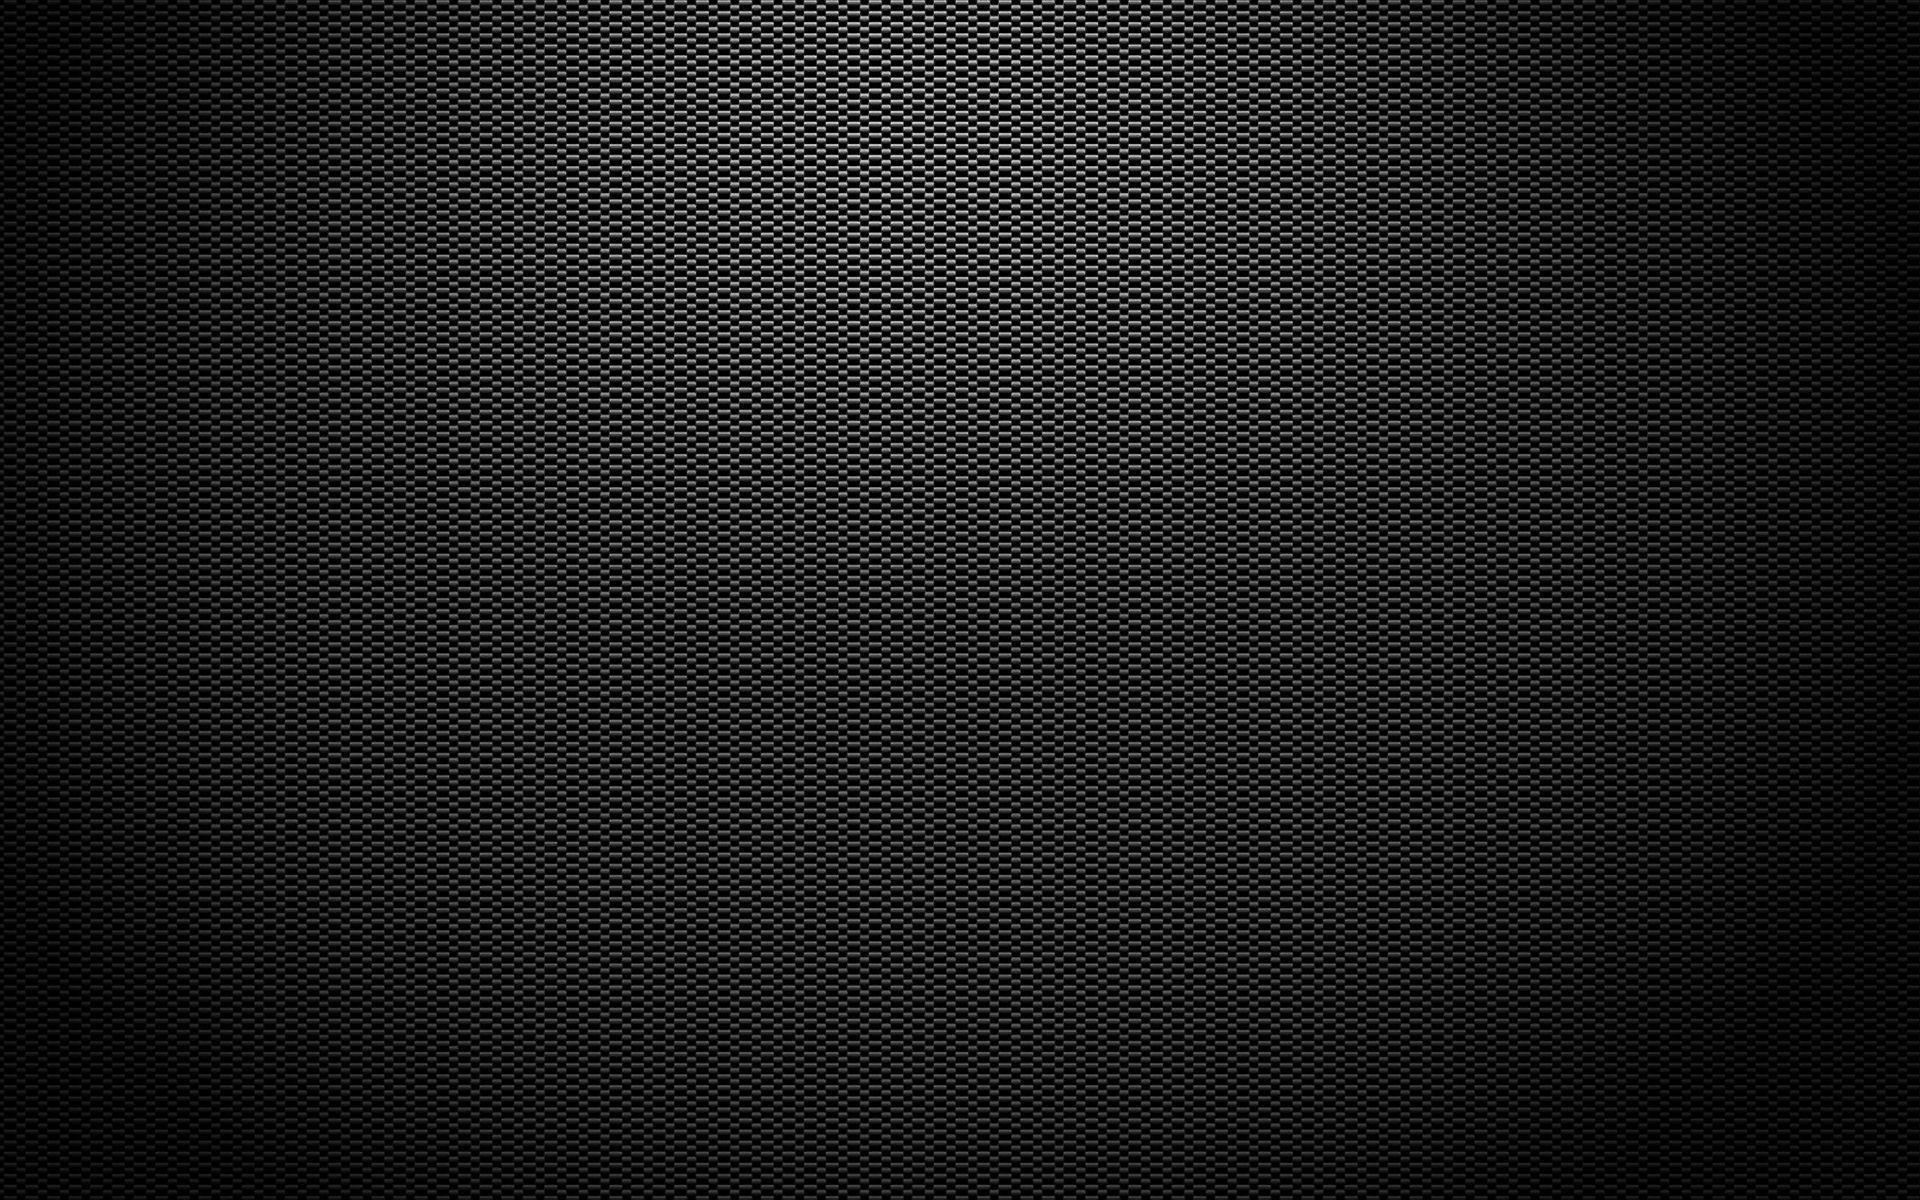 Download Dark Carbon Fiber Wave Pattern Iphone